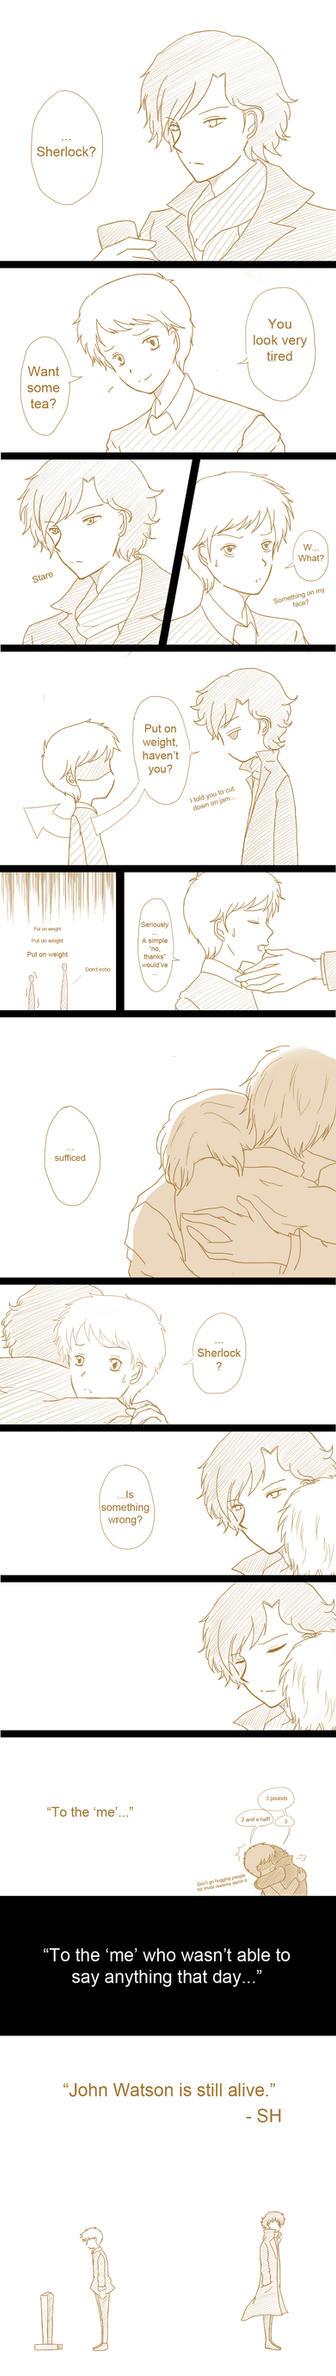 Sincerely by Voidance-kun